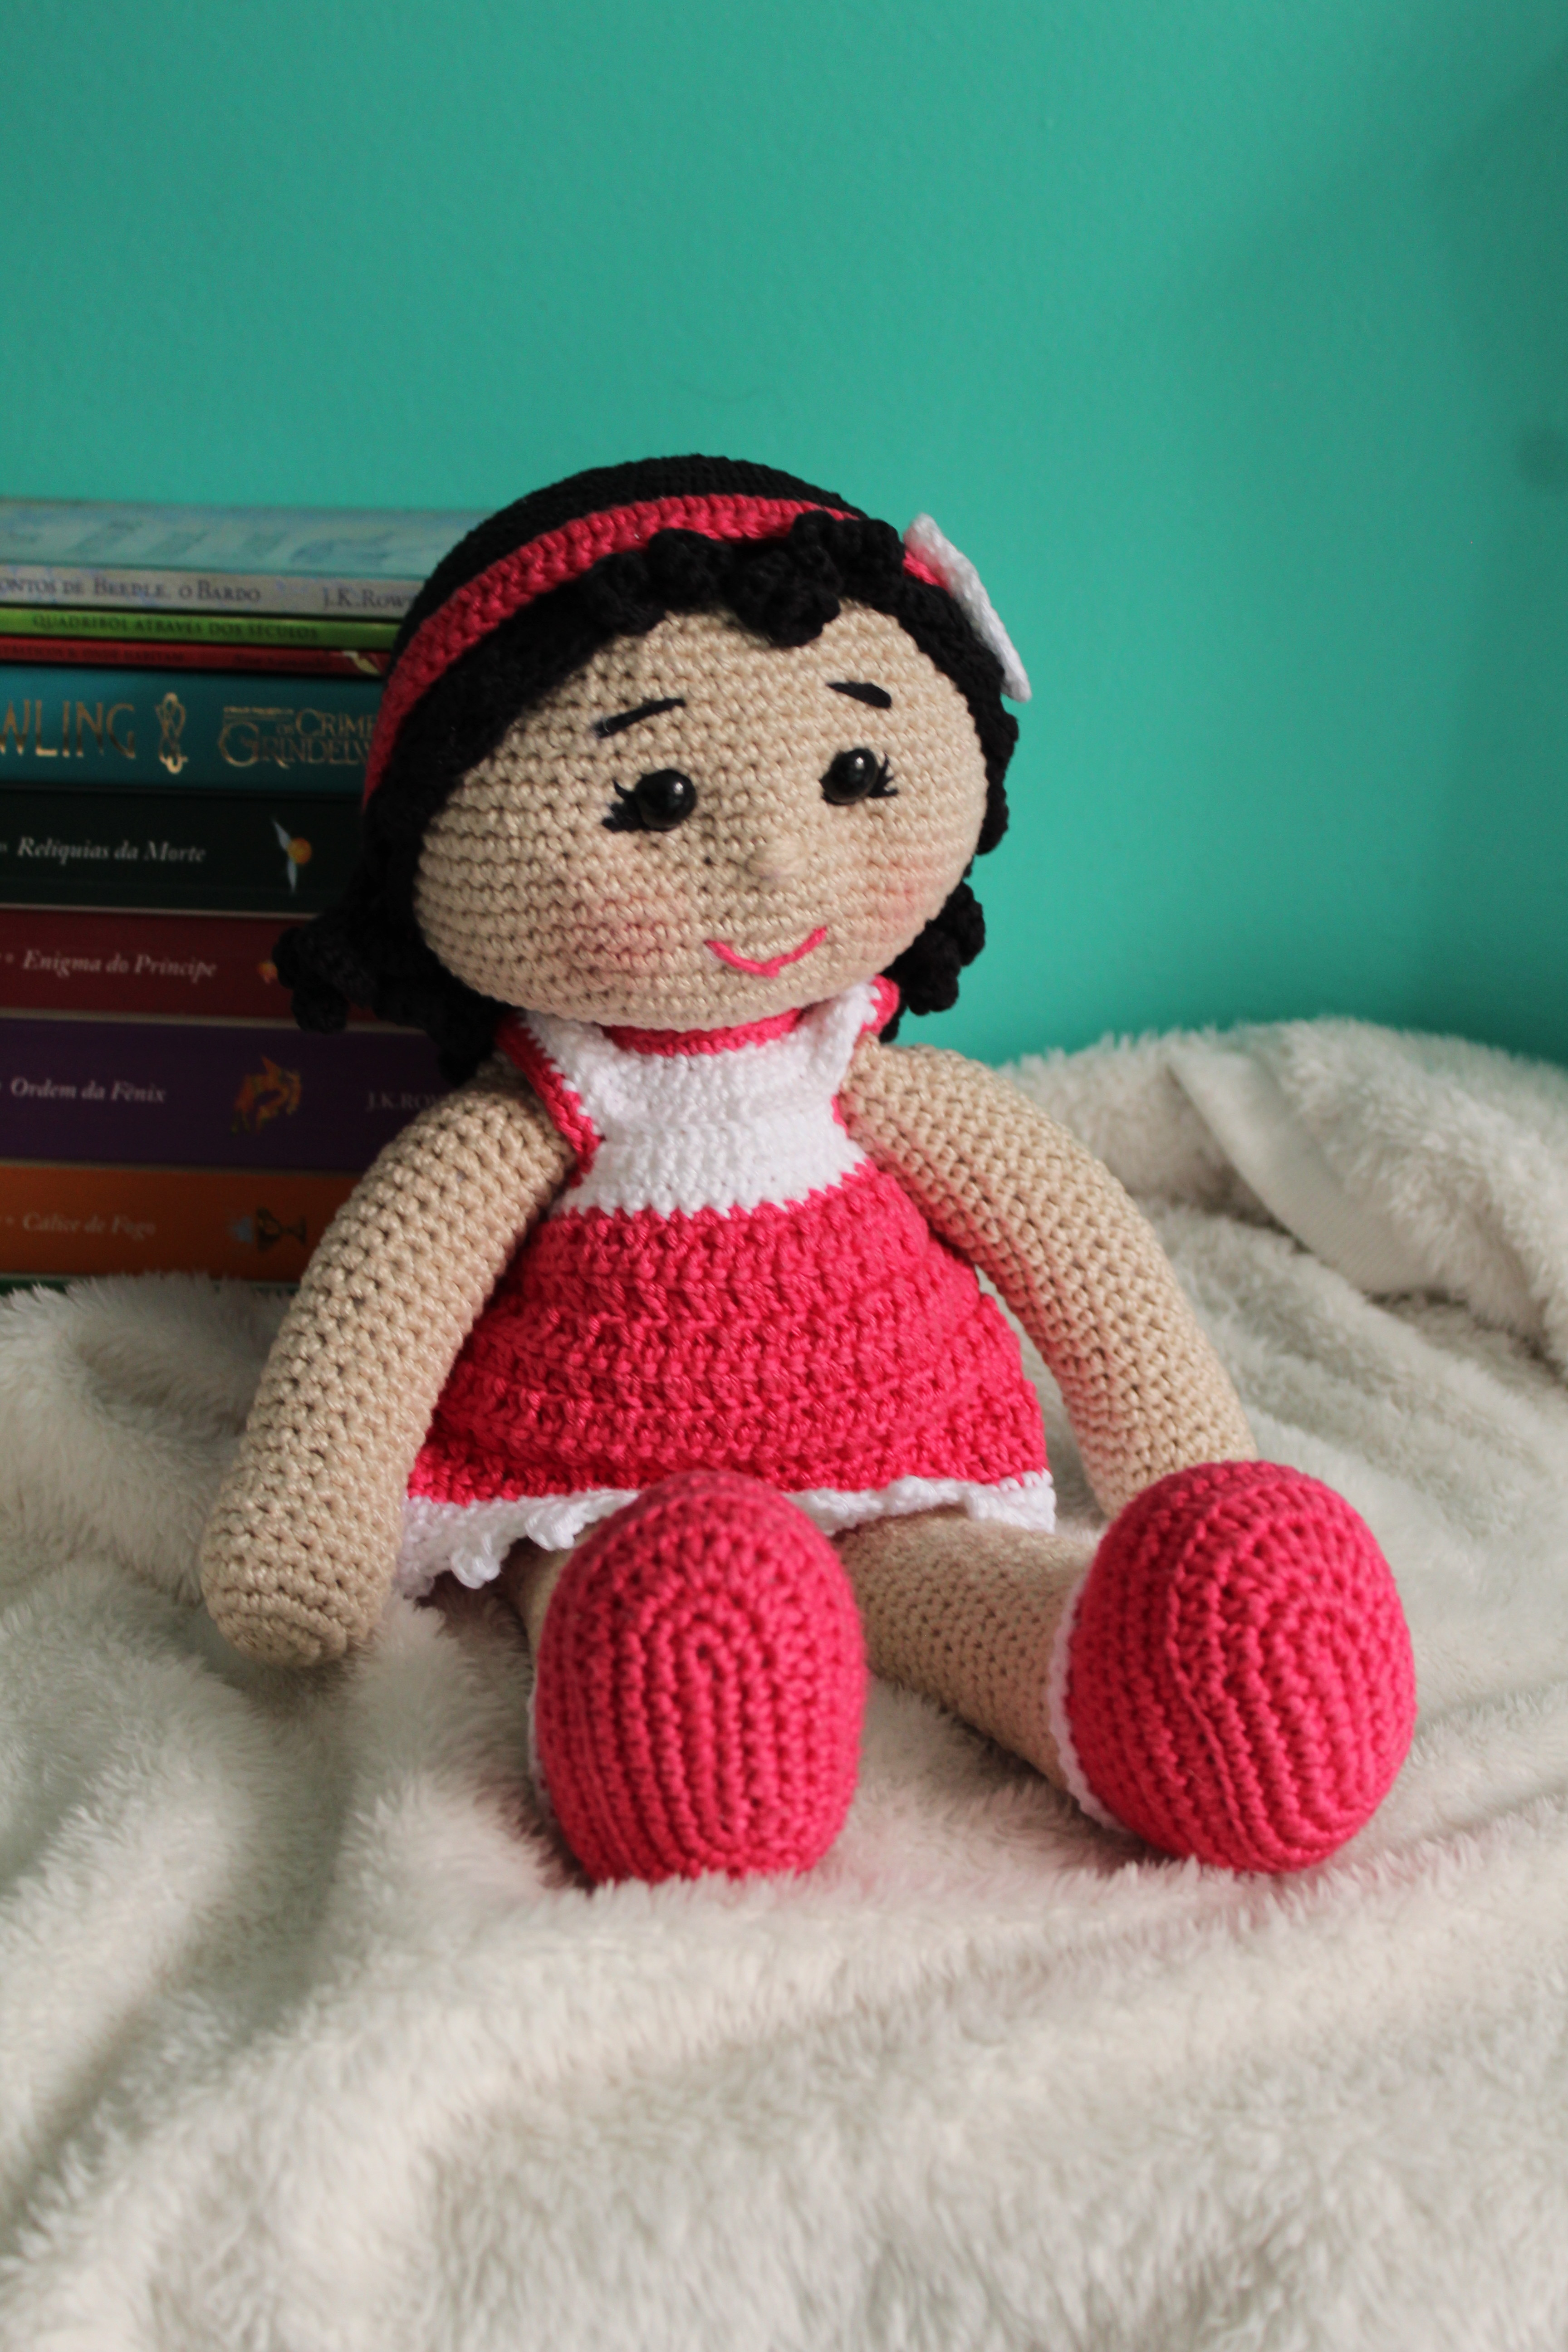 Boneca de croche Lulu + Coelhinho Tob amigurumi 25cm no Elo7 ...   5184x3456